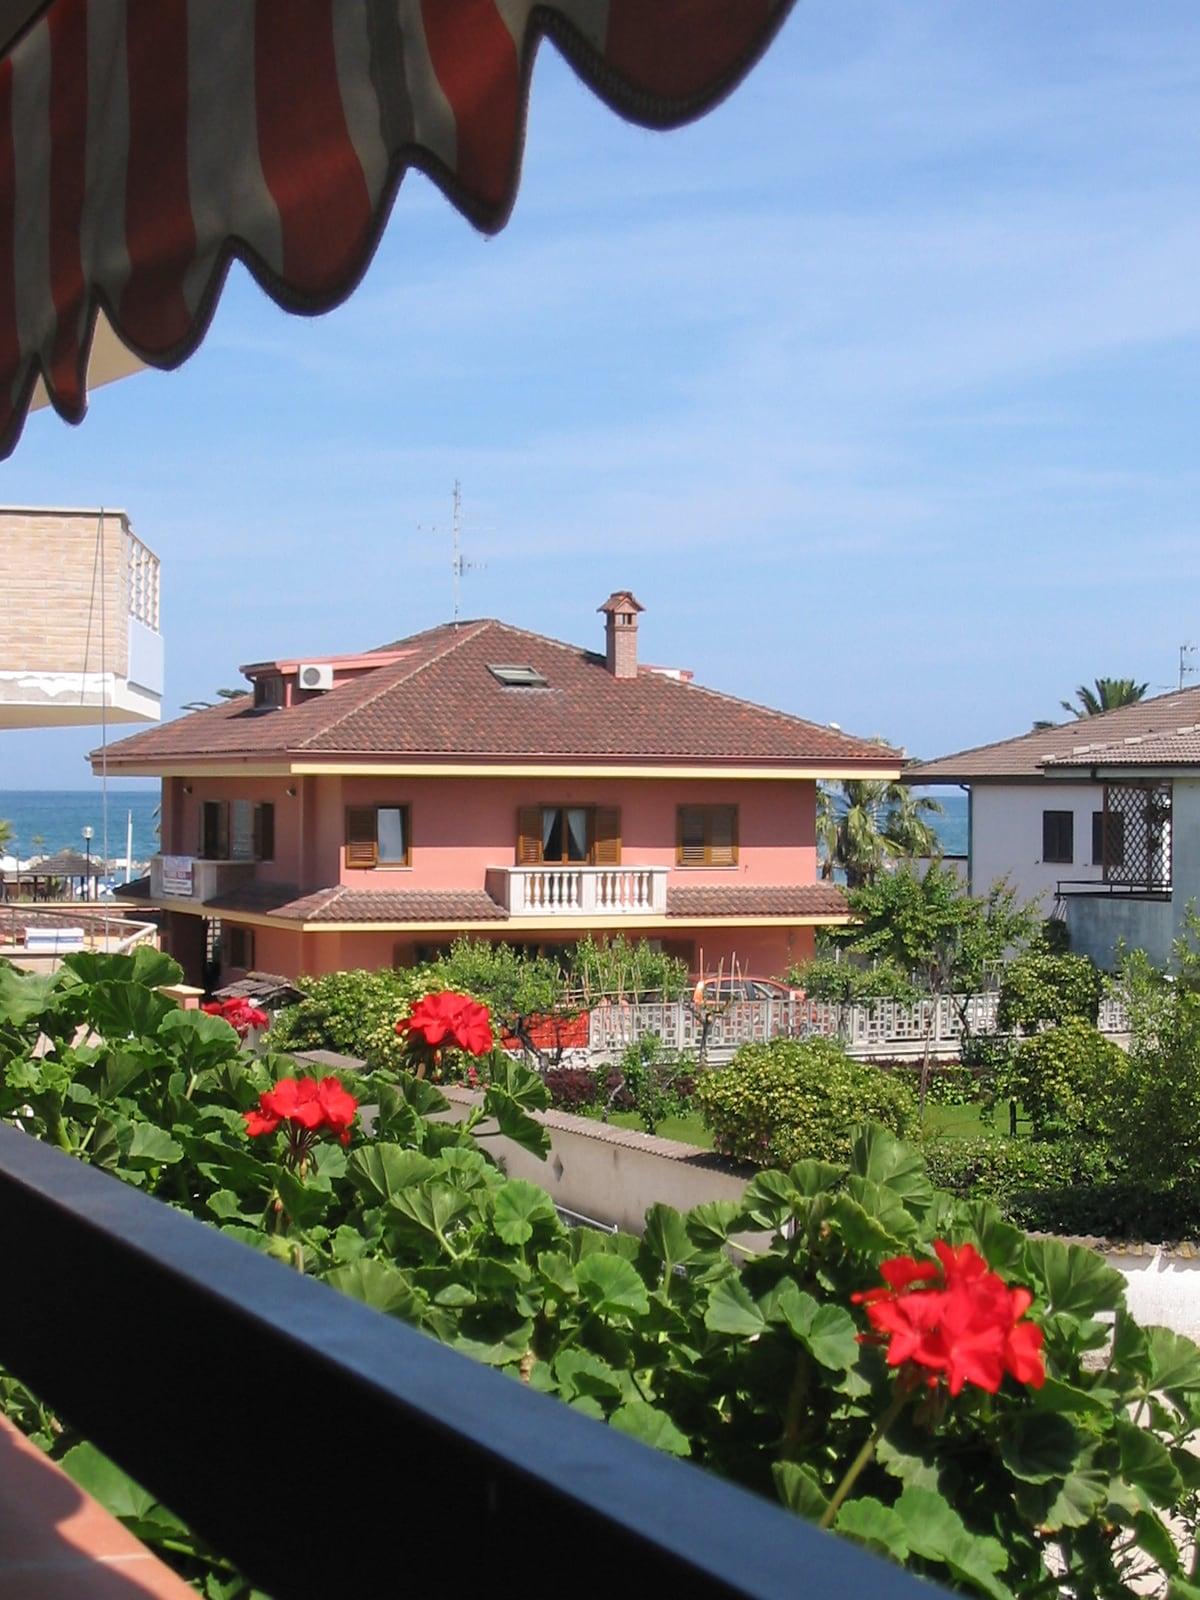 ROSETO BEACH HOUSE - BEACH & WIFI